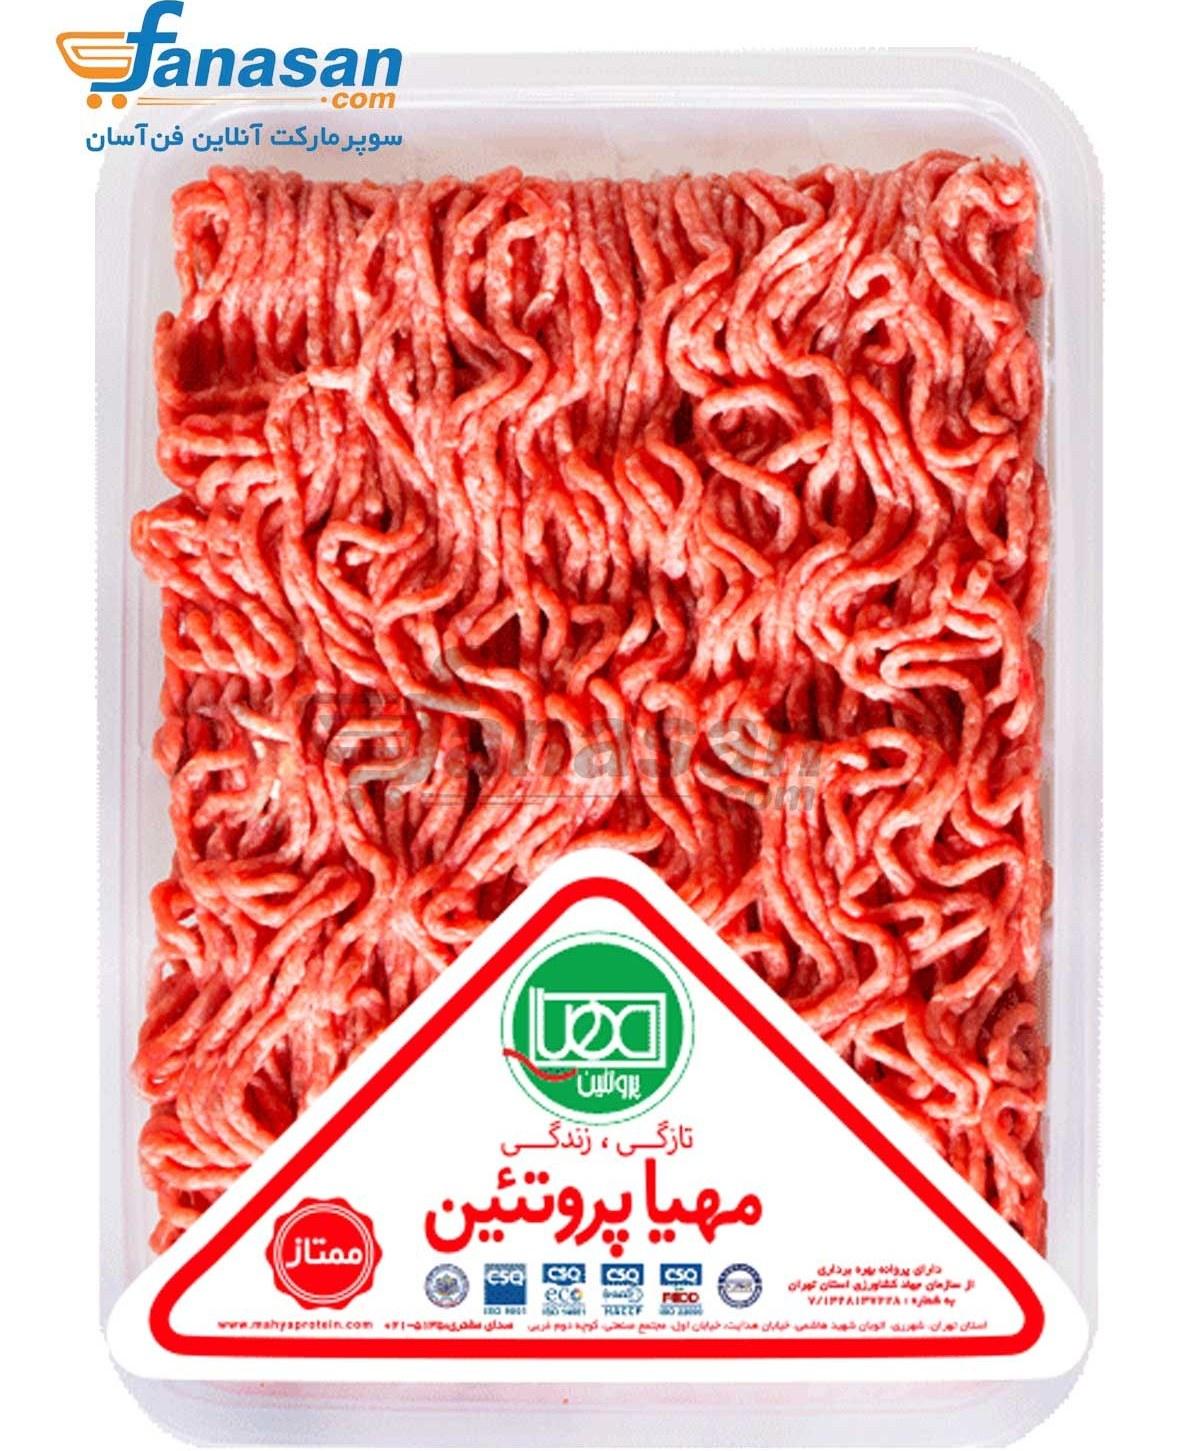 چرخکرده ممتاز گوساله مهیا پروتئین 1000 گرم   Mahya Protein Meat Grinded Calf 1000 gr